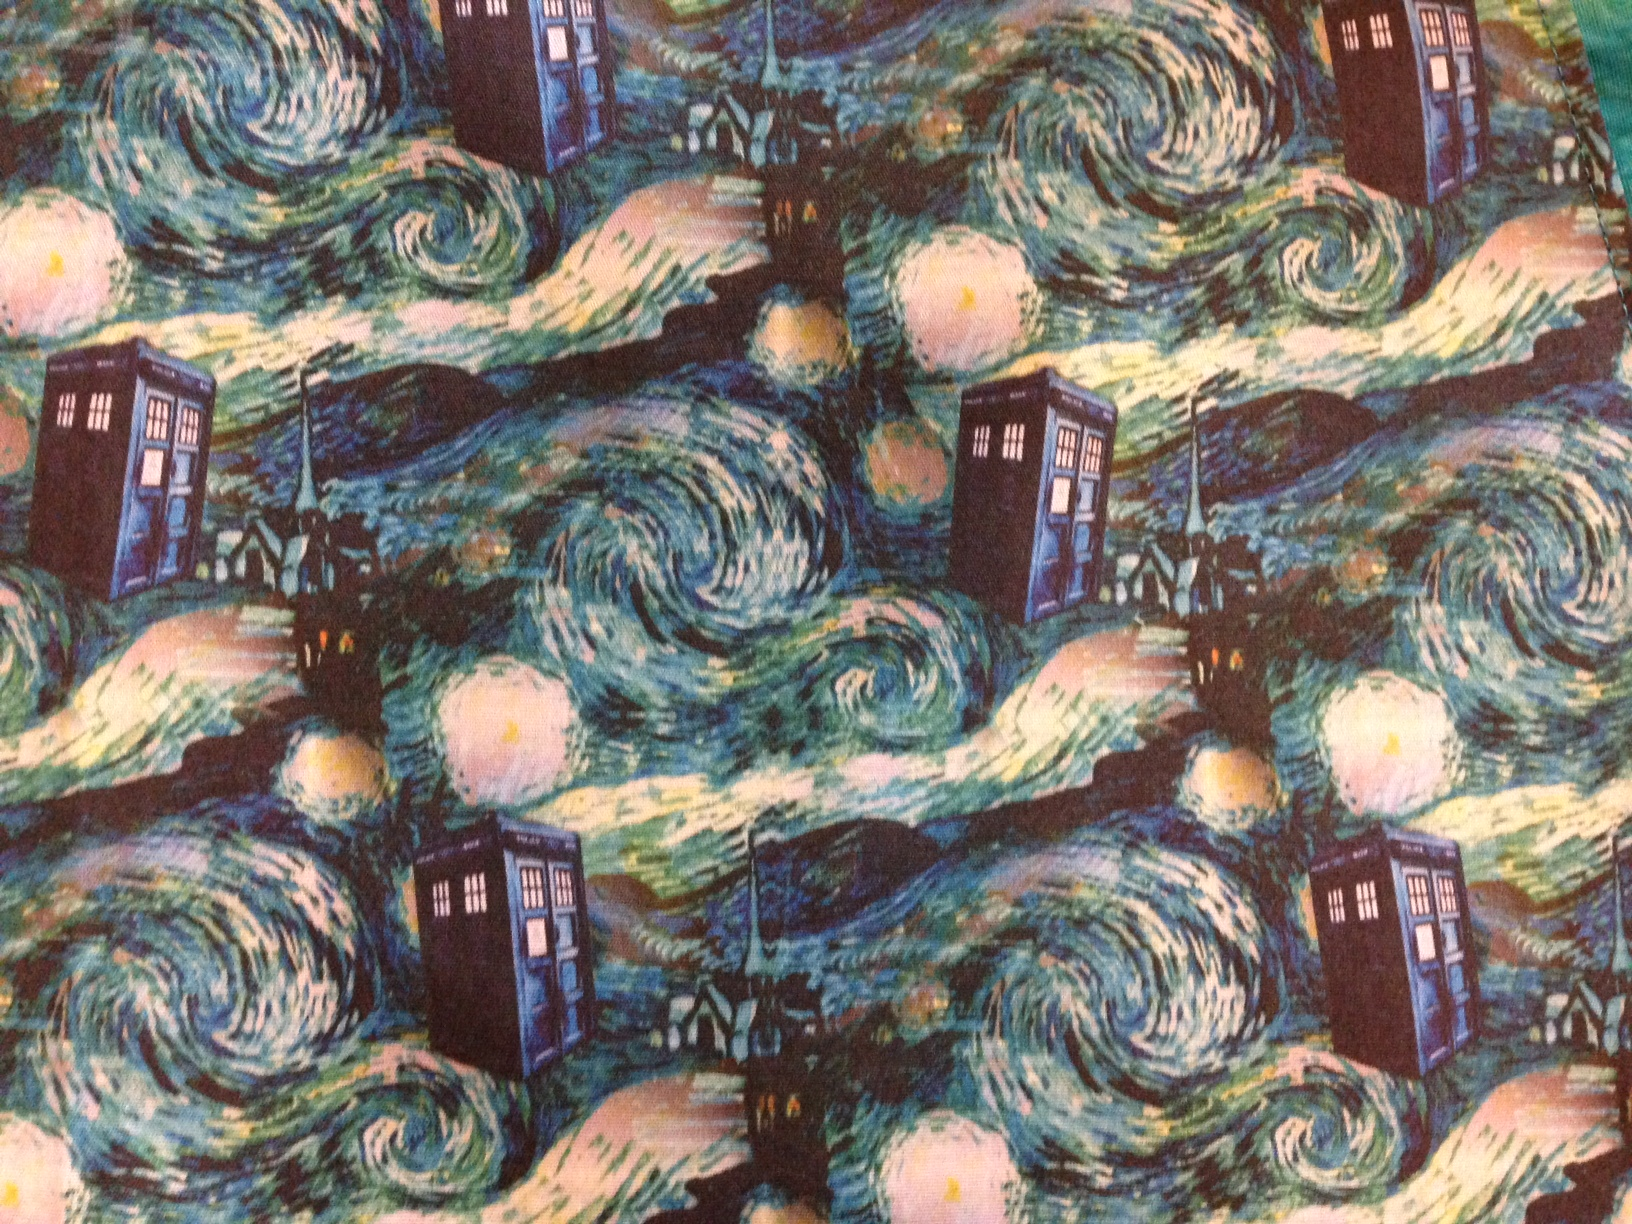 White apron joann fabrics - Doctor Who Dr Who Tardis Retro Apron Blue Green Teal Ruffle Trim Full Apron Batik I Got Some Off White Ruffle Trim From Joanns